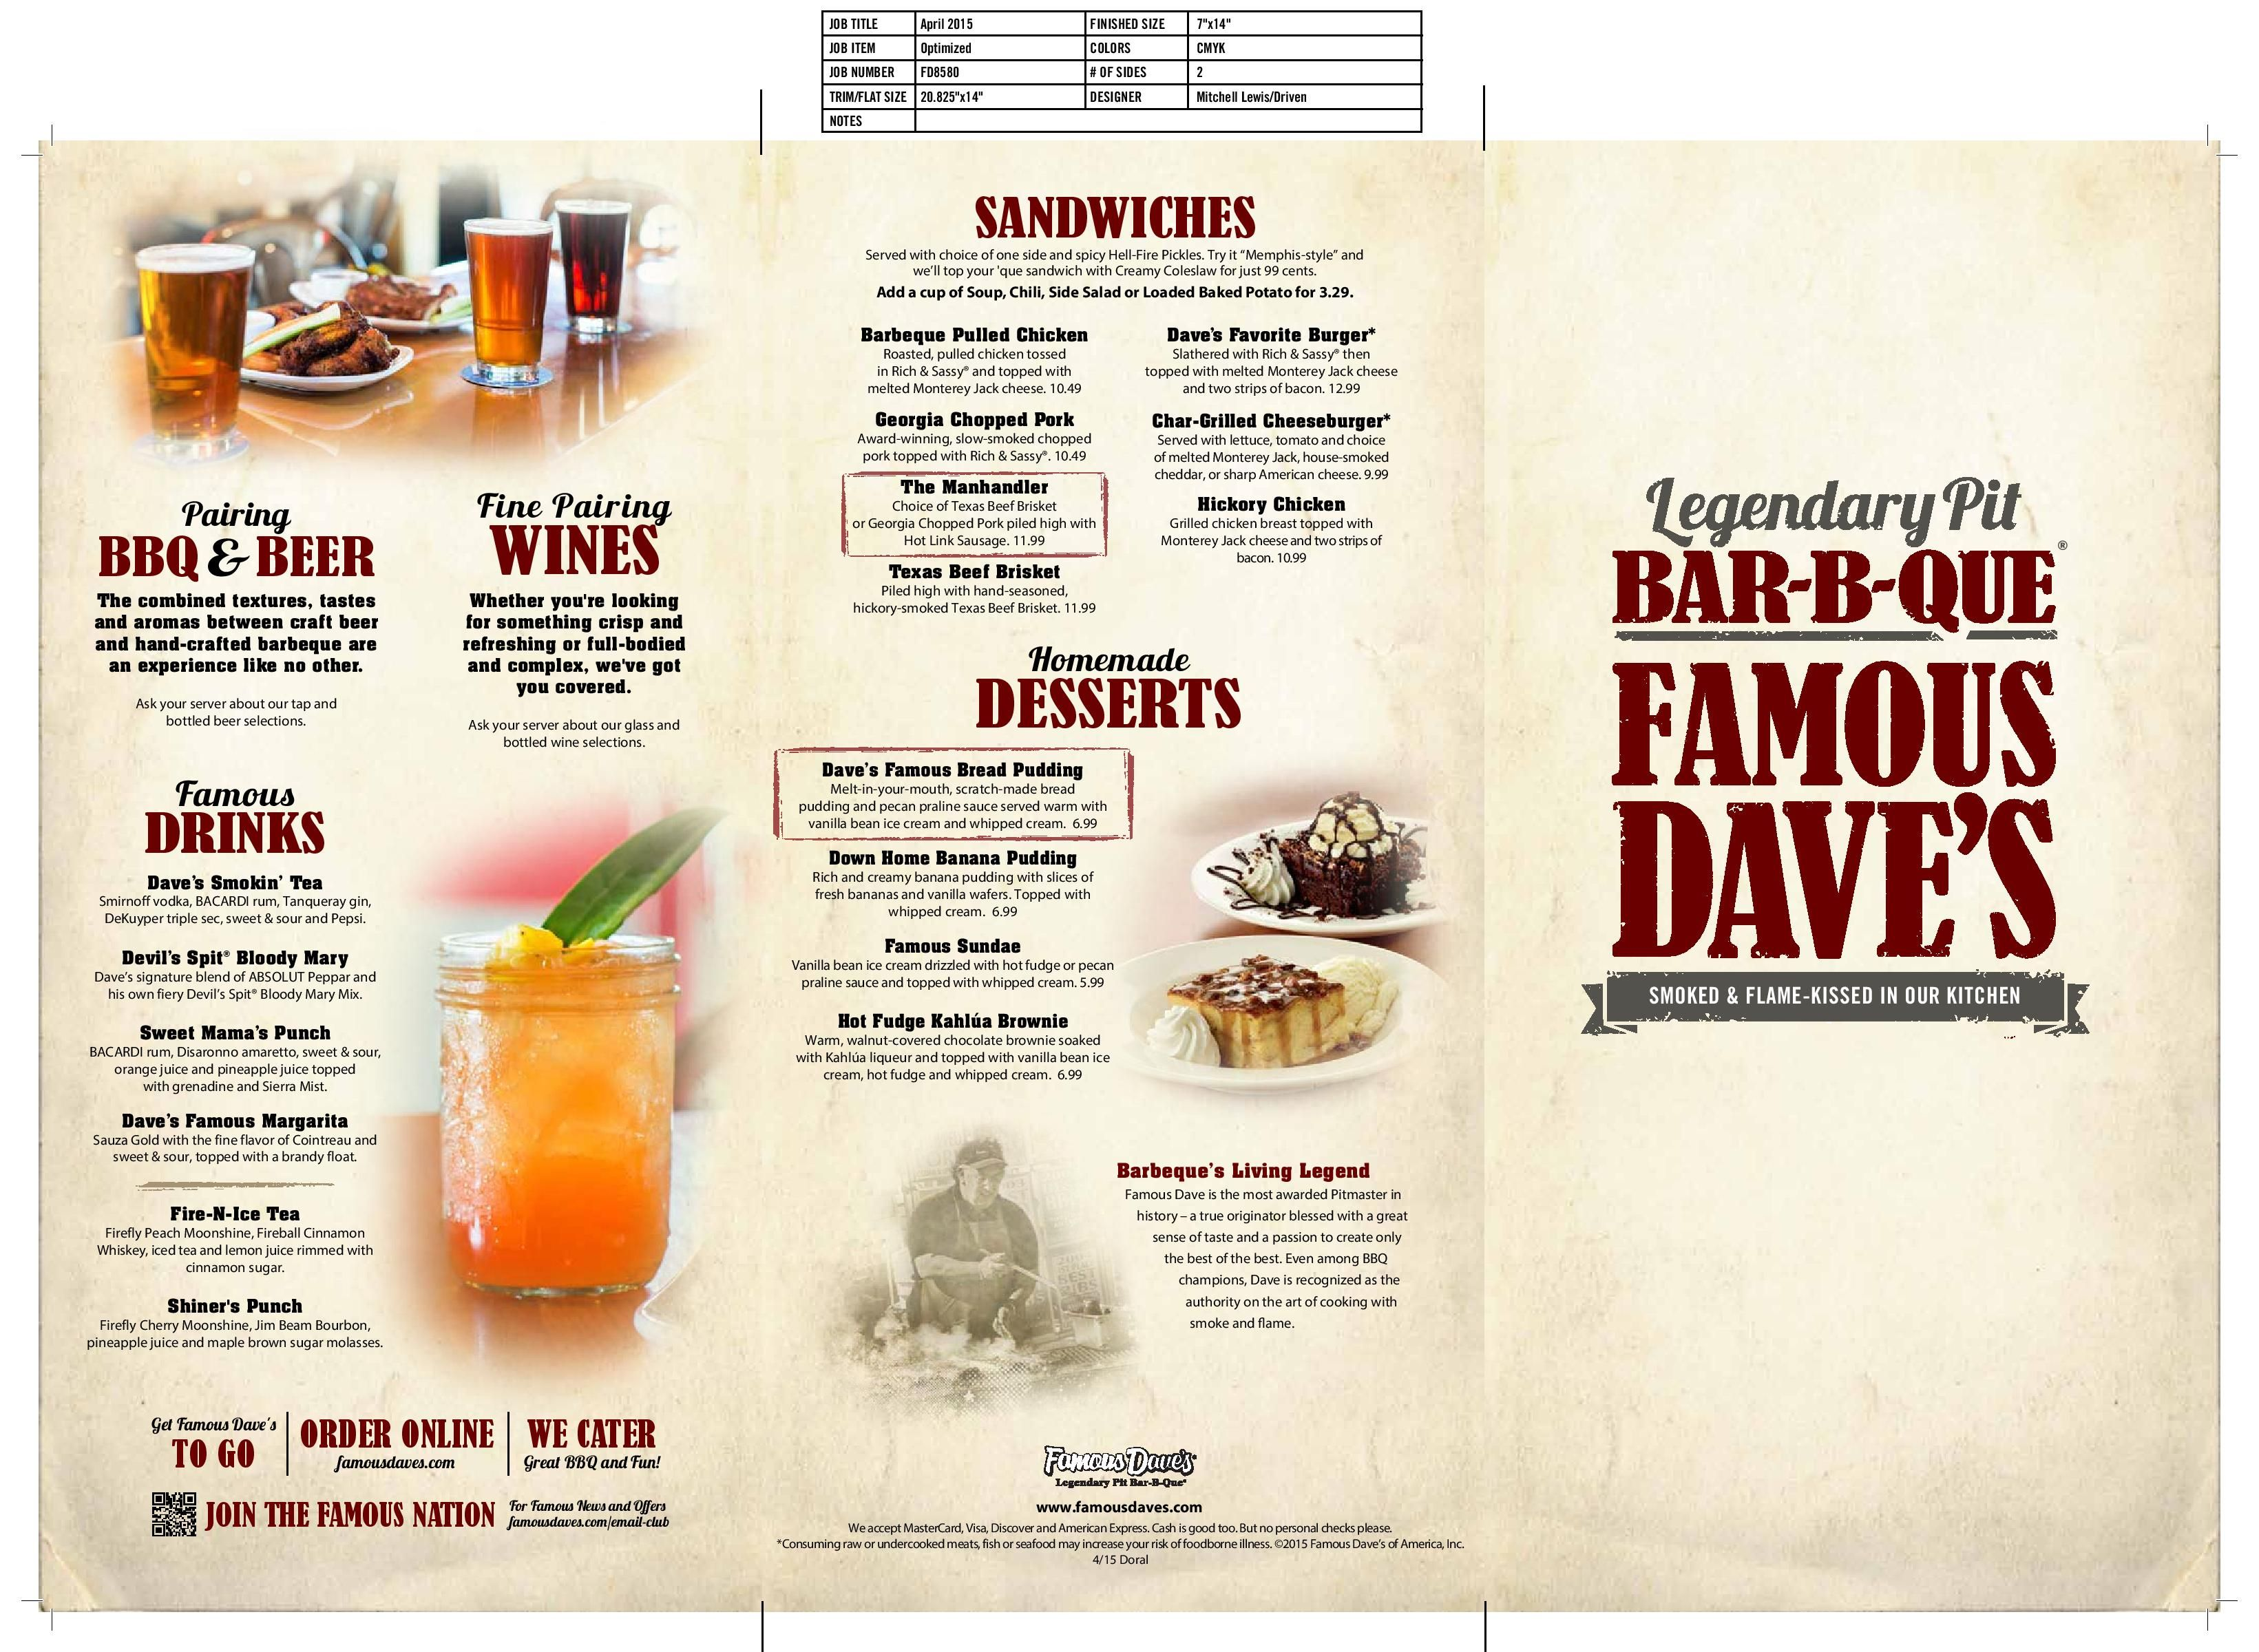 famous dave's doral (famousdavedoral) on pinterest